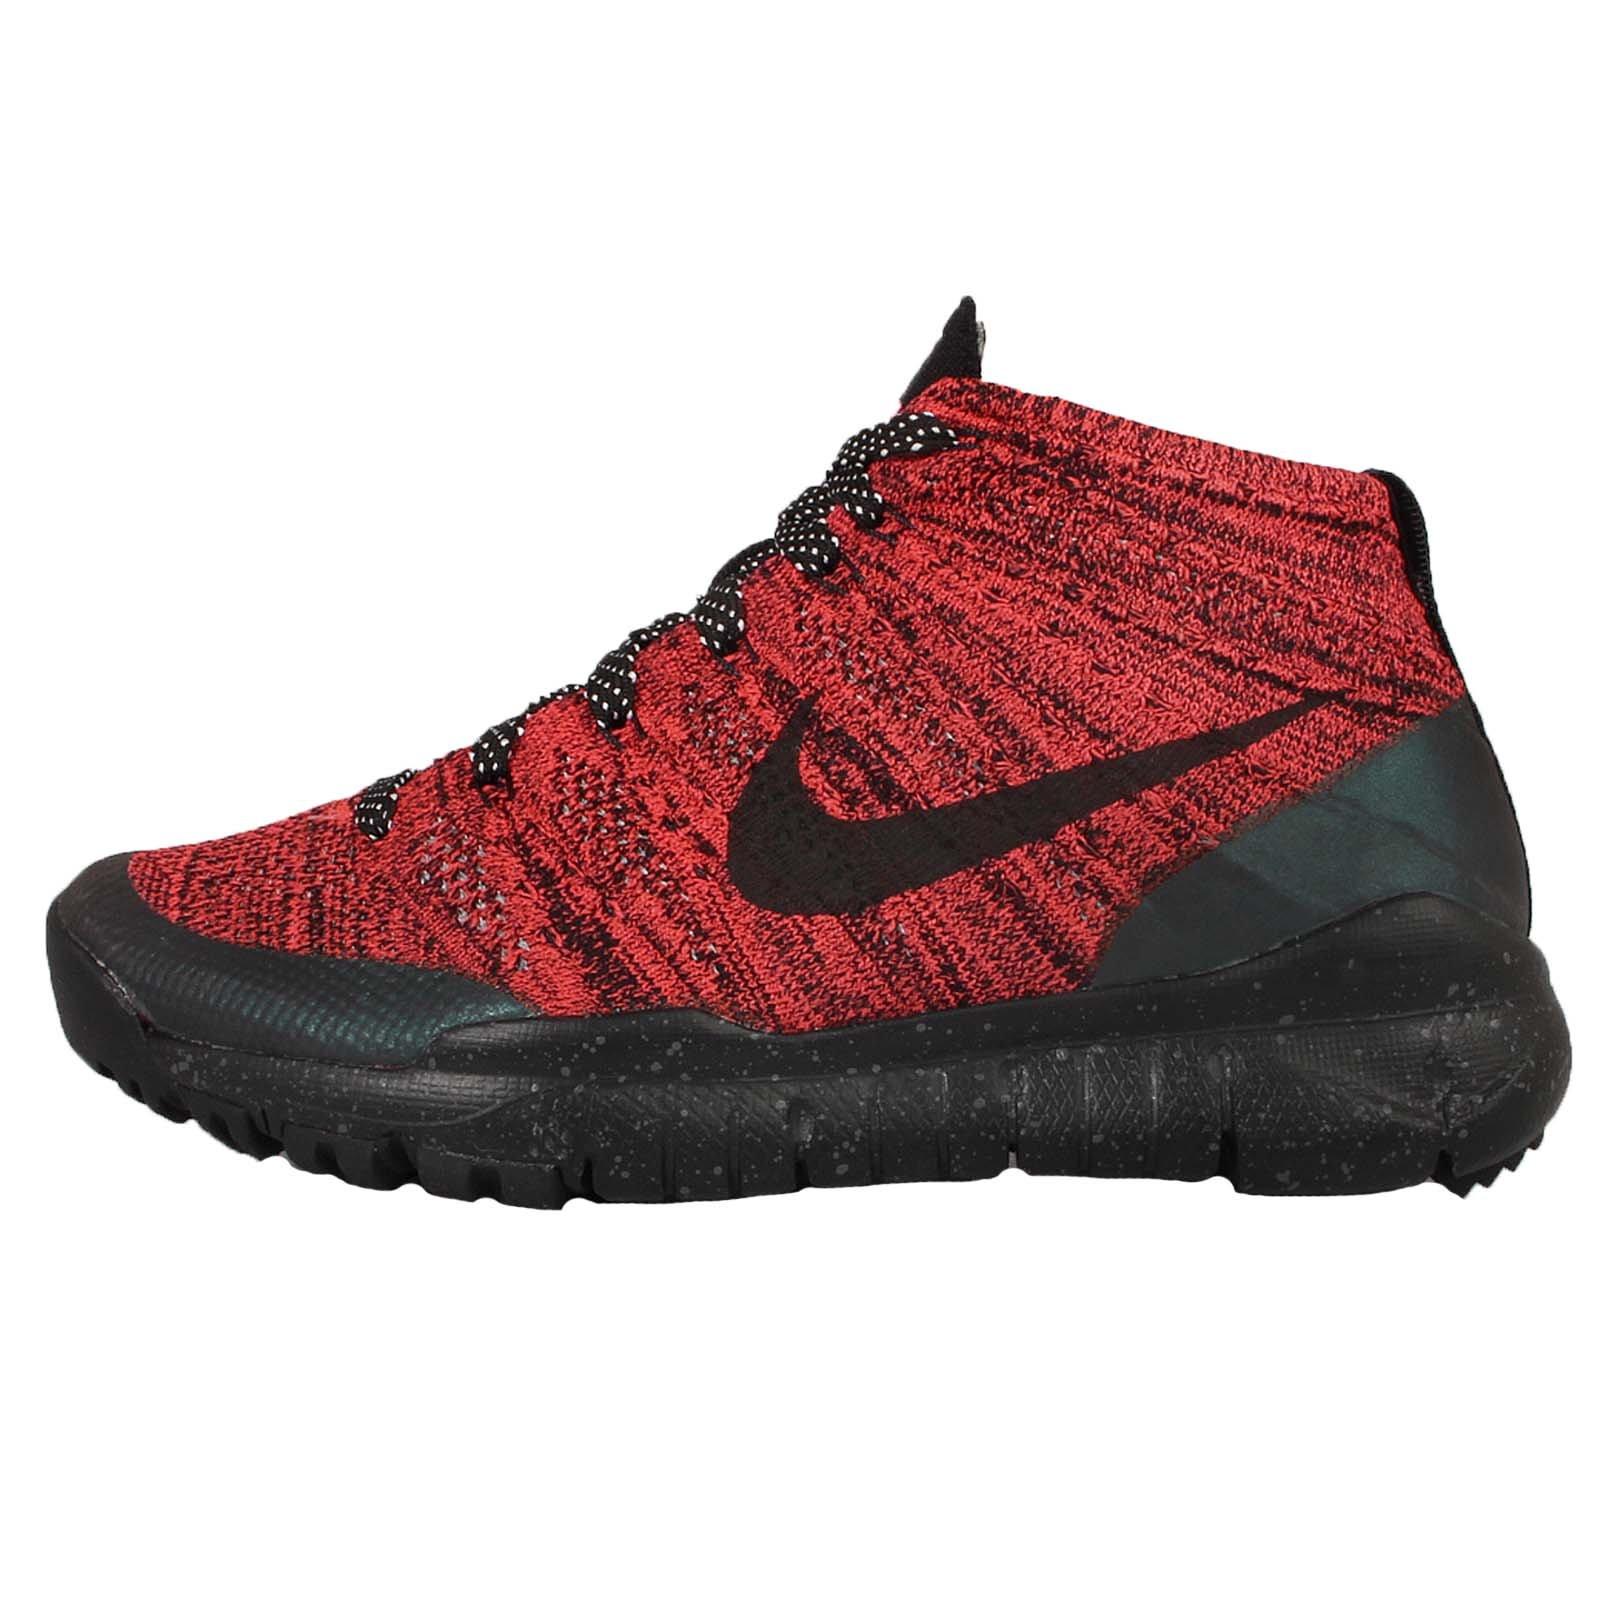 Nike Women's Wmns Flyknit Trainer Chukka FSB, BRIGHT CRIMSON/BLACK-SEQUOIA, 7 US